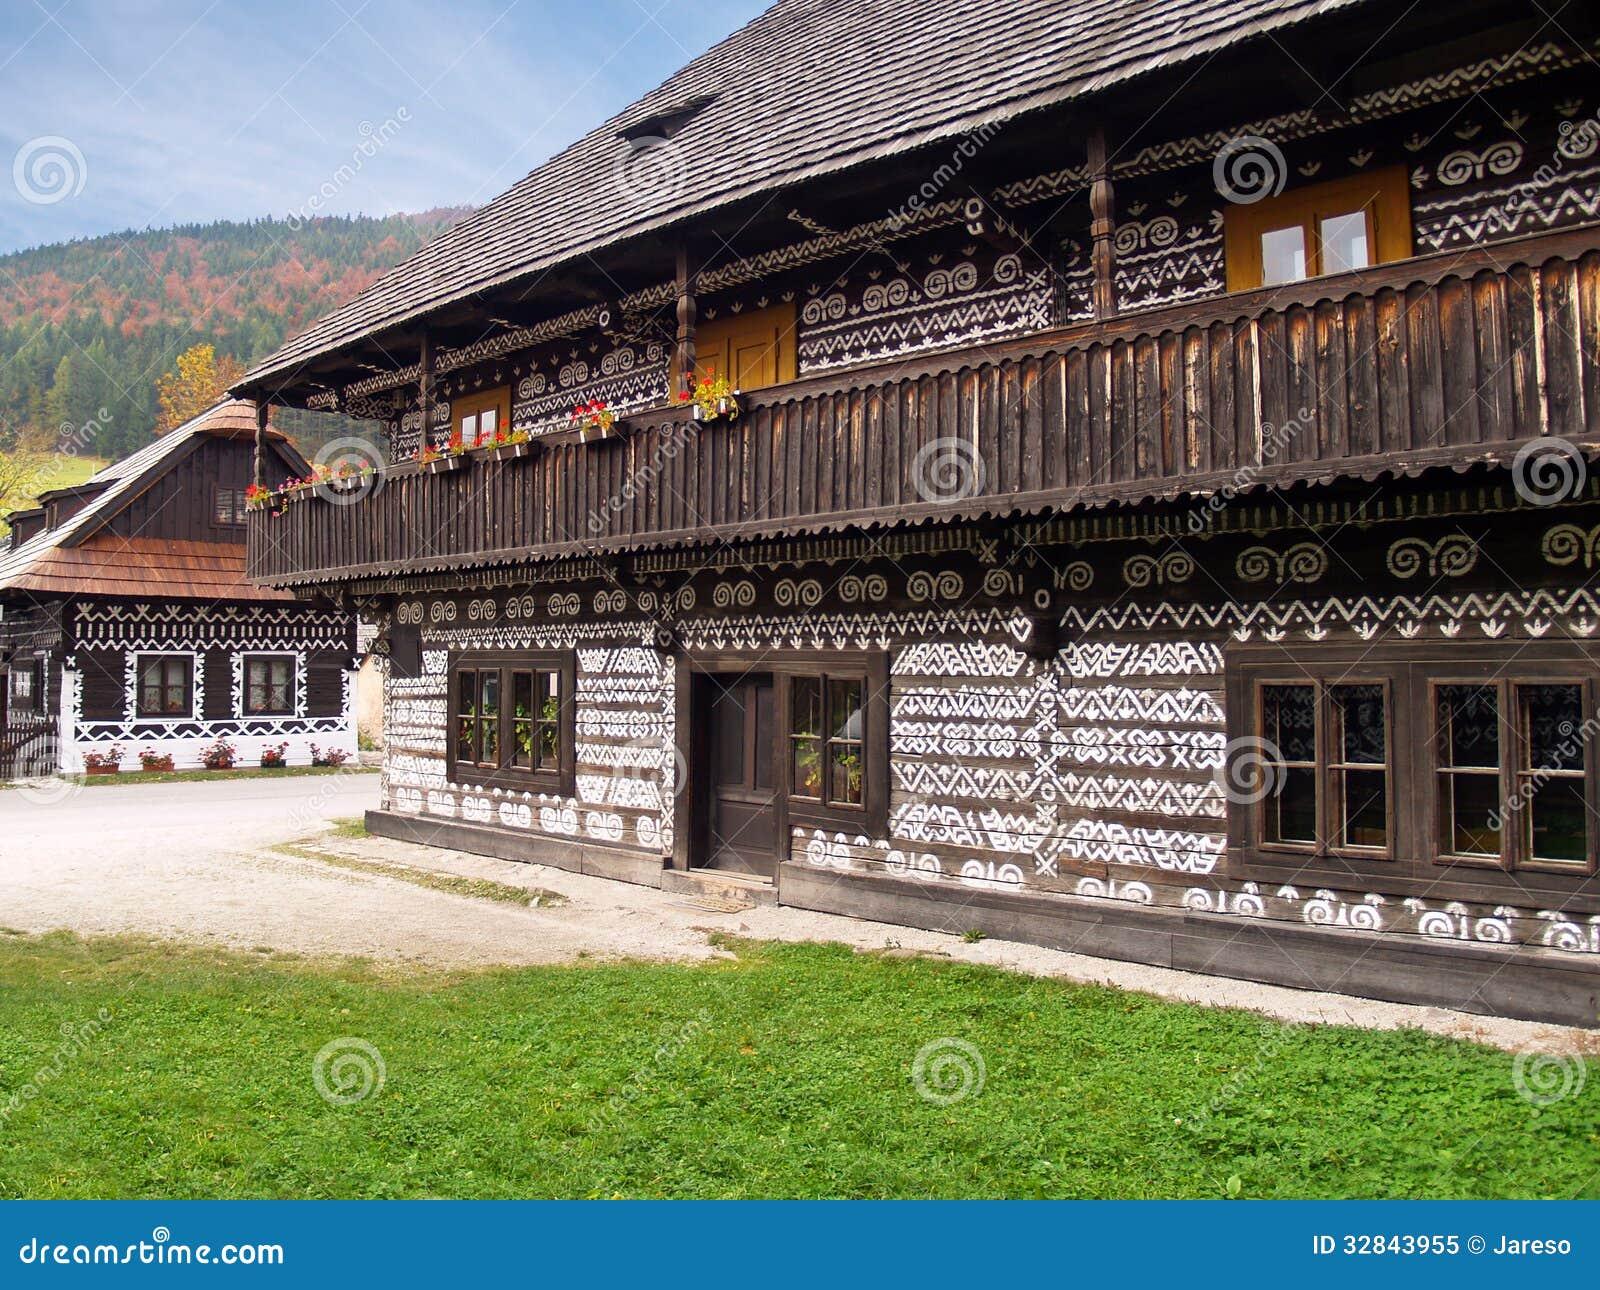 Unique folk houses in Cicmany, Slovakia